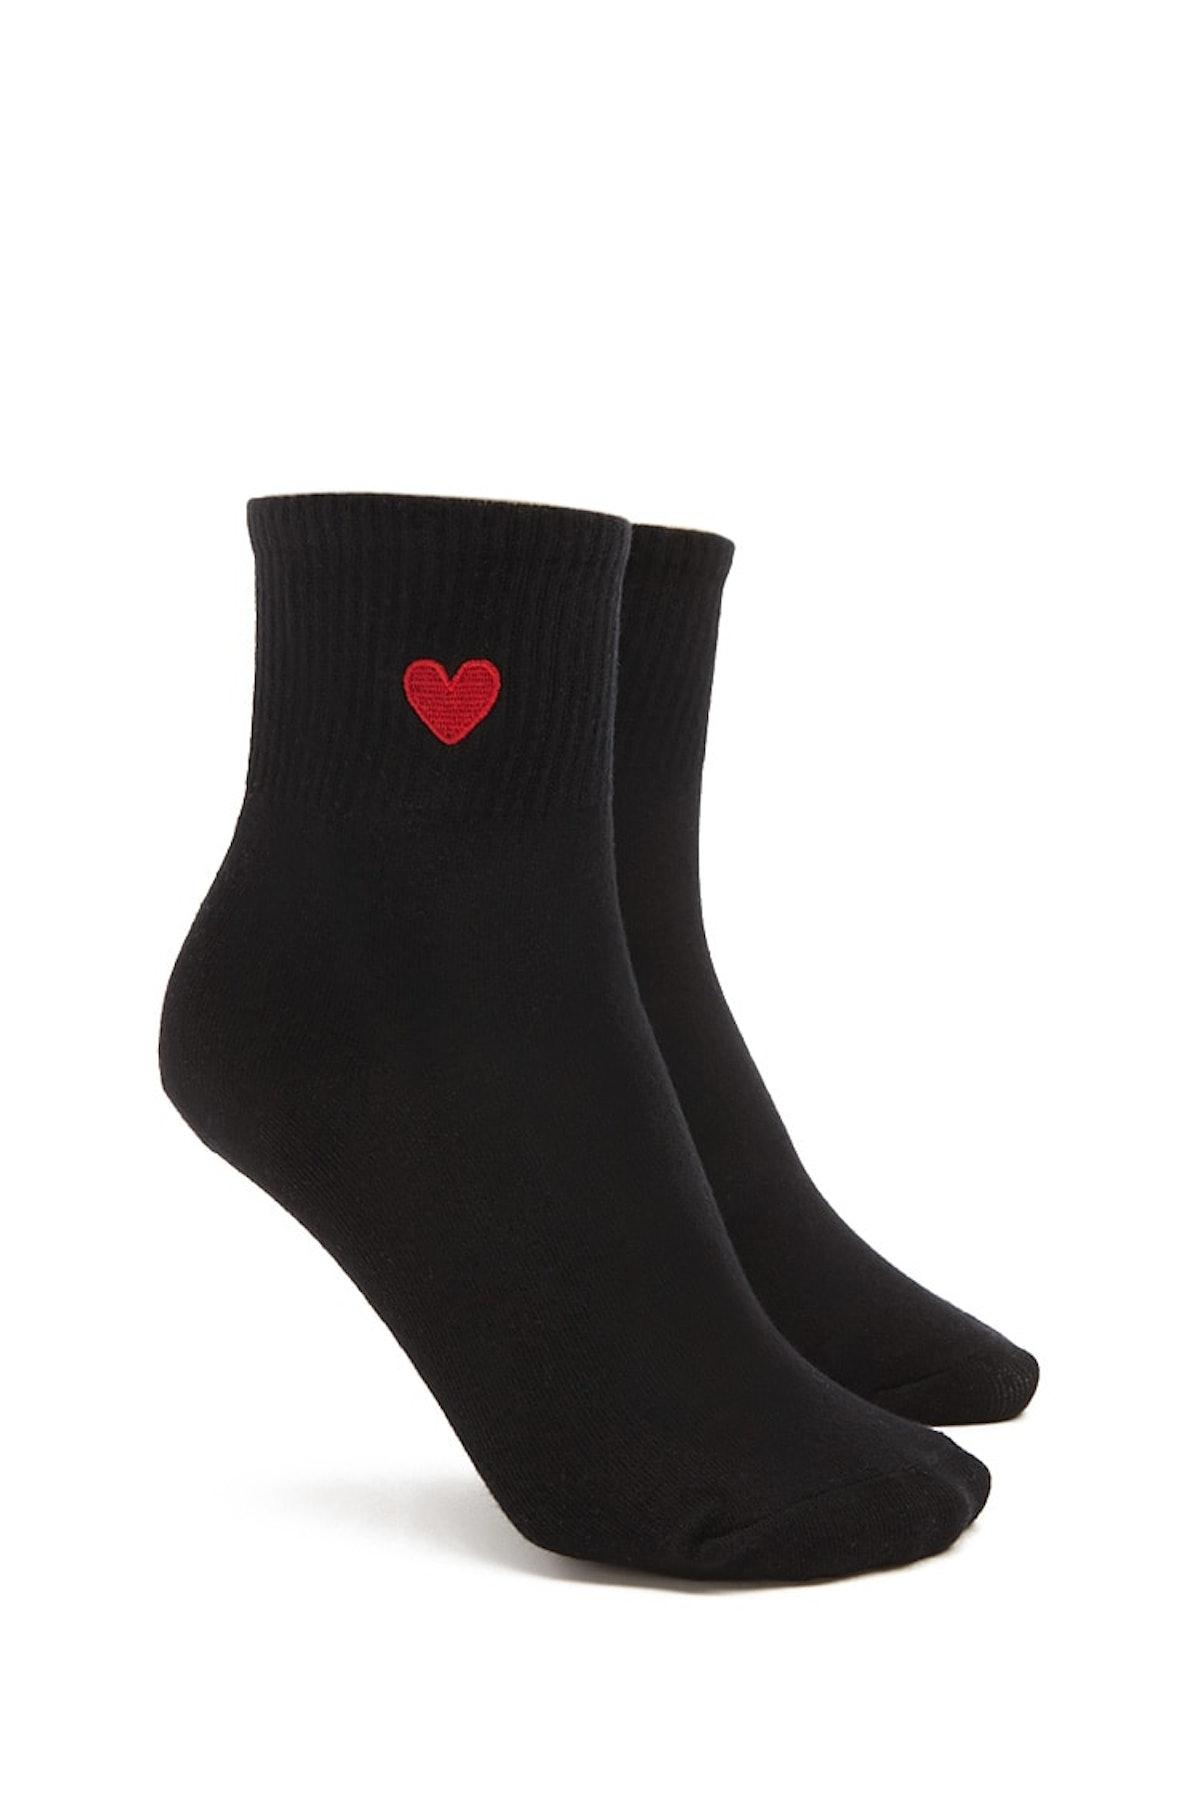 Heart Graphic Crew Socks